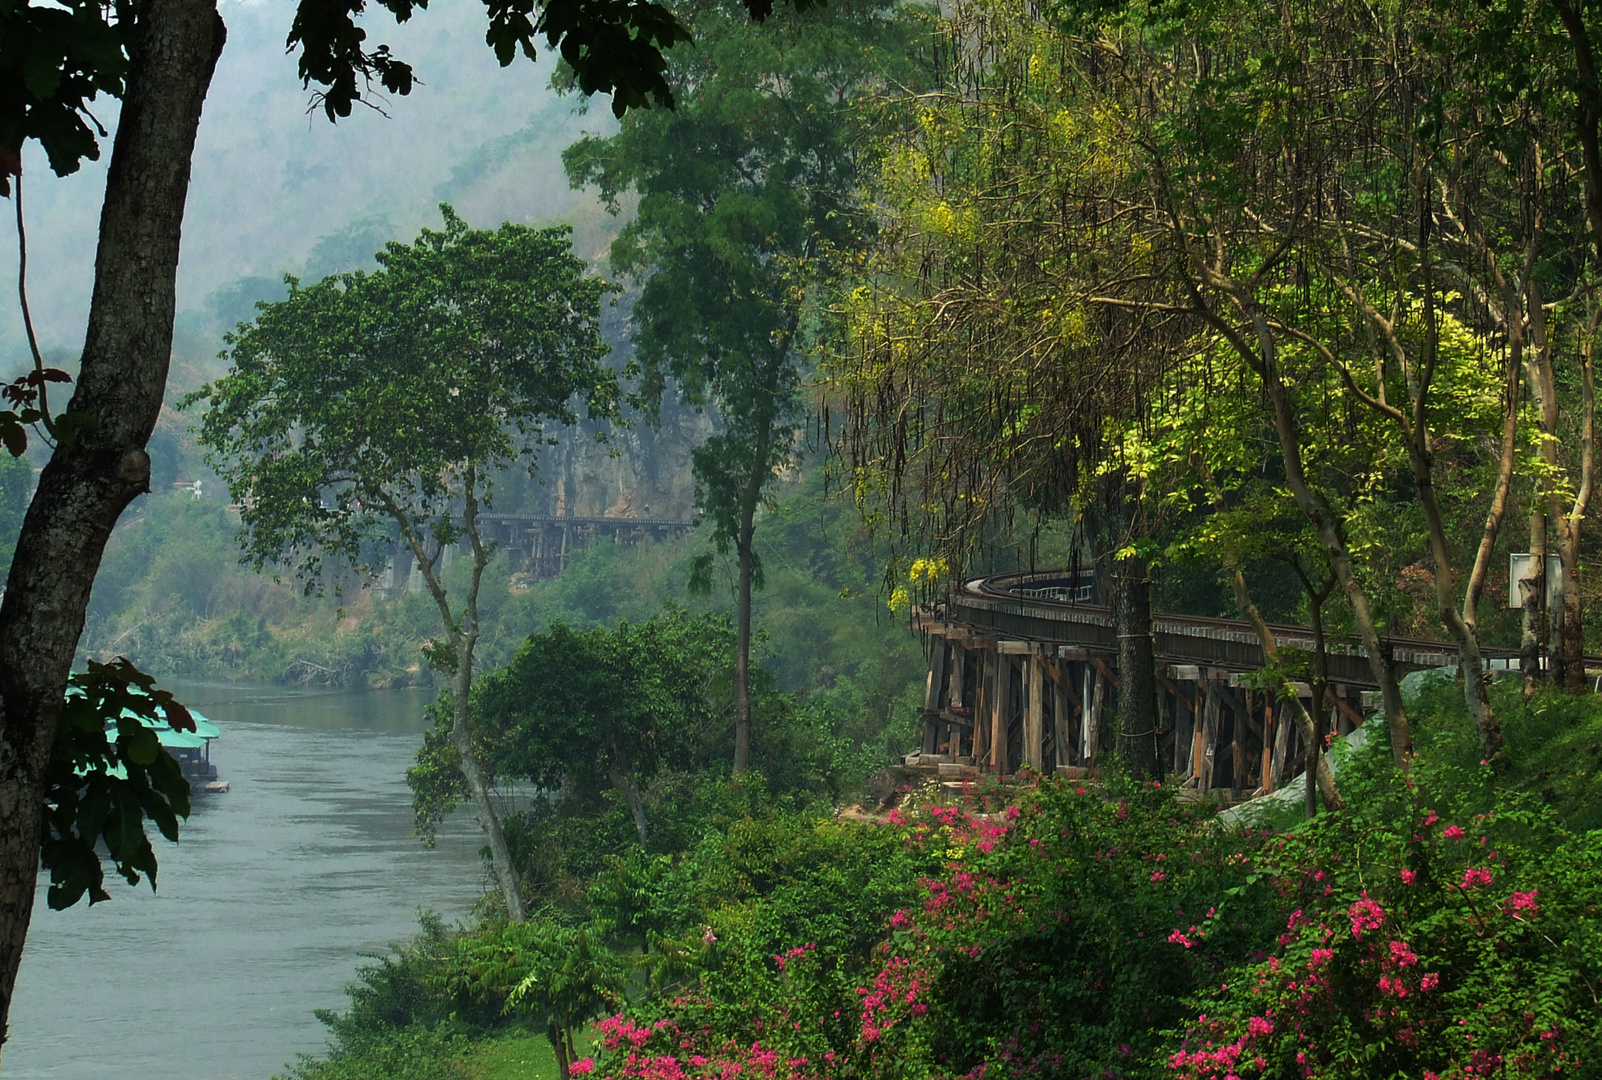 Death Railway, Tham Krasae Bridge, Kwai Noi